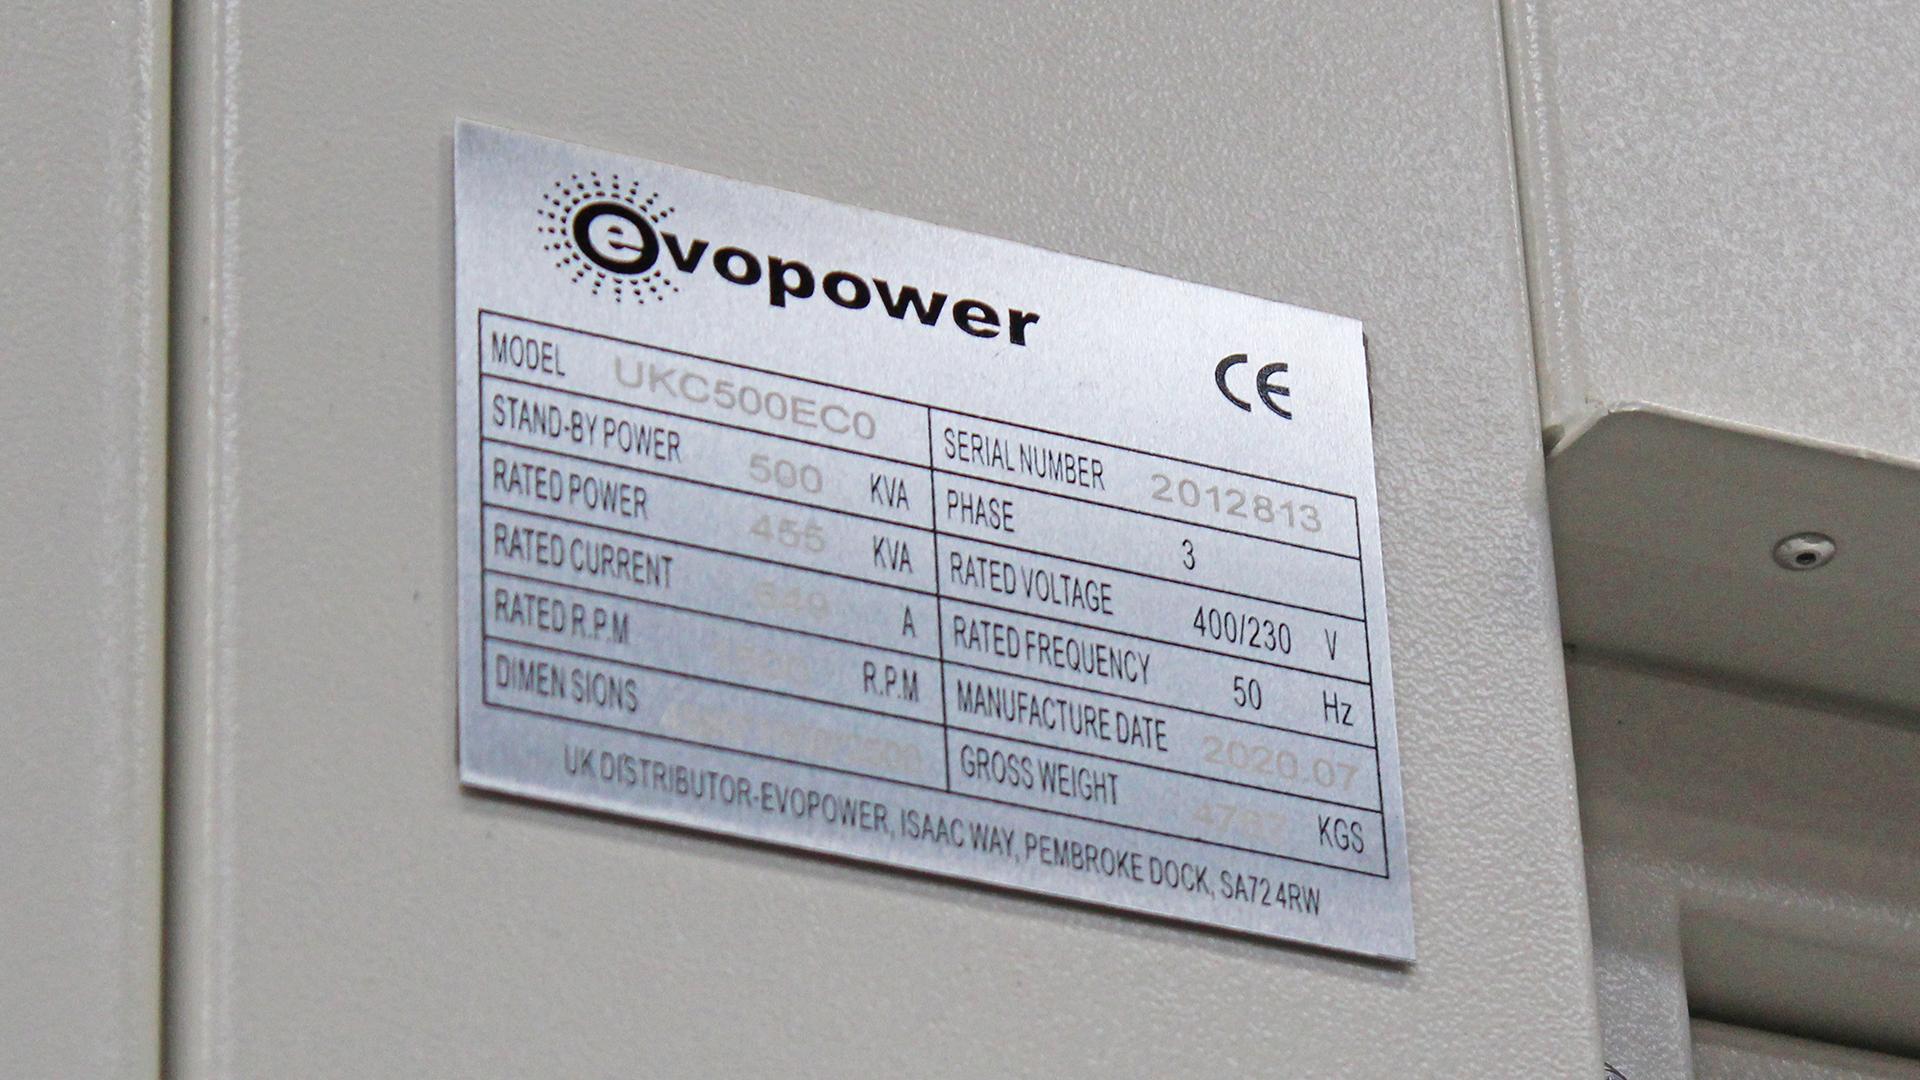 Spec plate - UKC500ECO Cummins Powered 500kVA generator spec plate